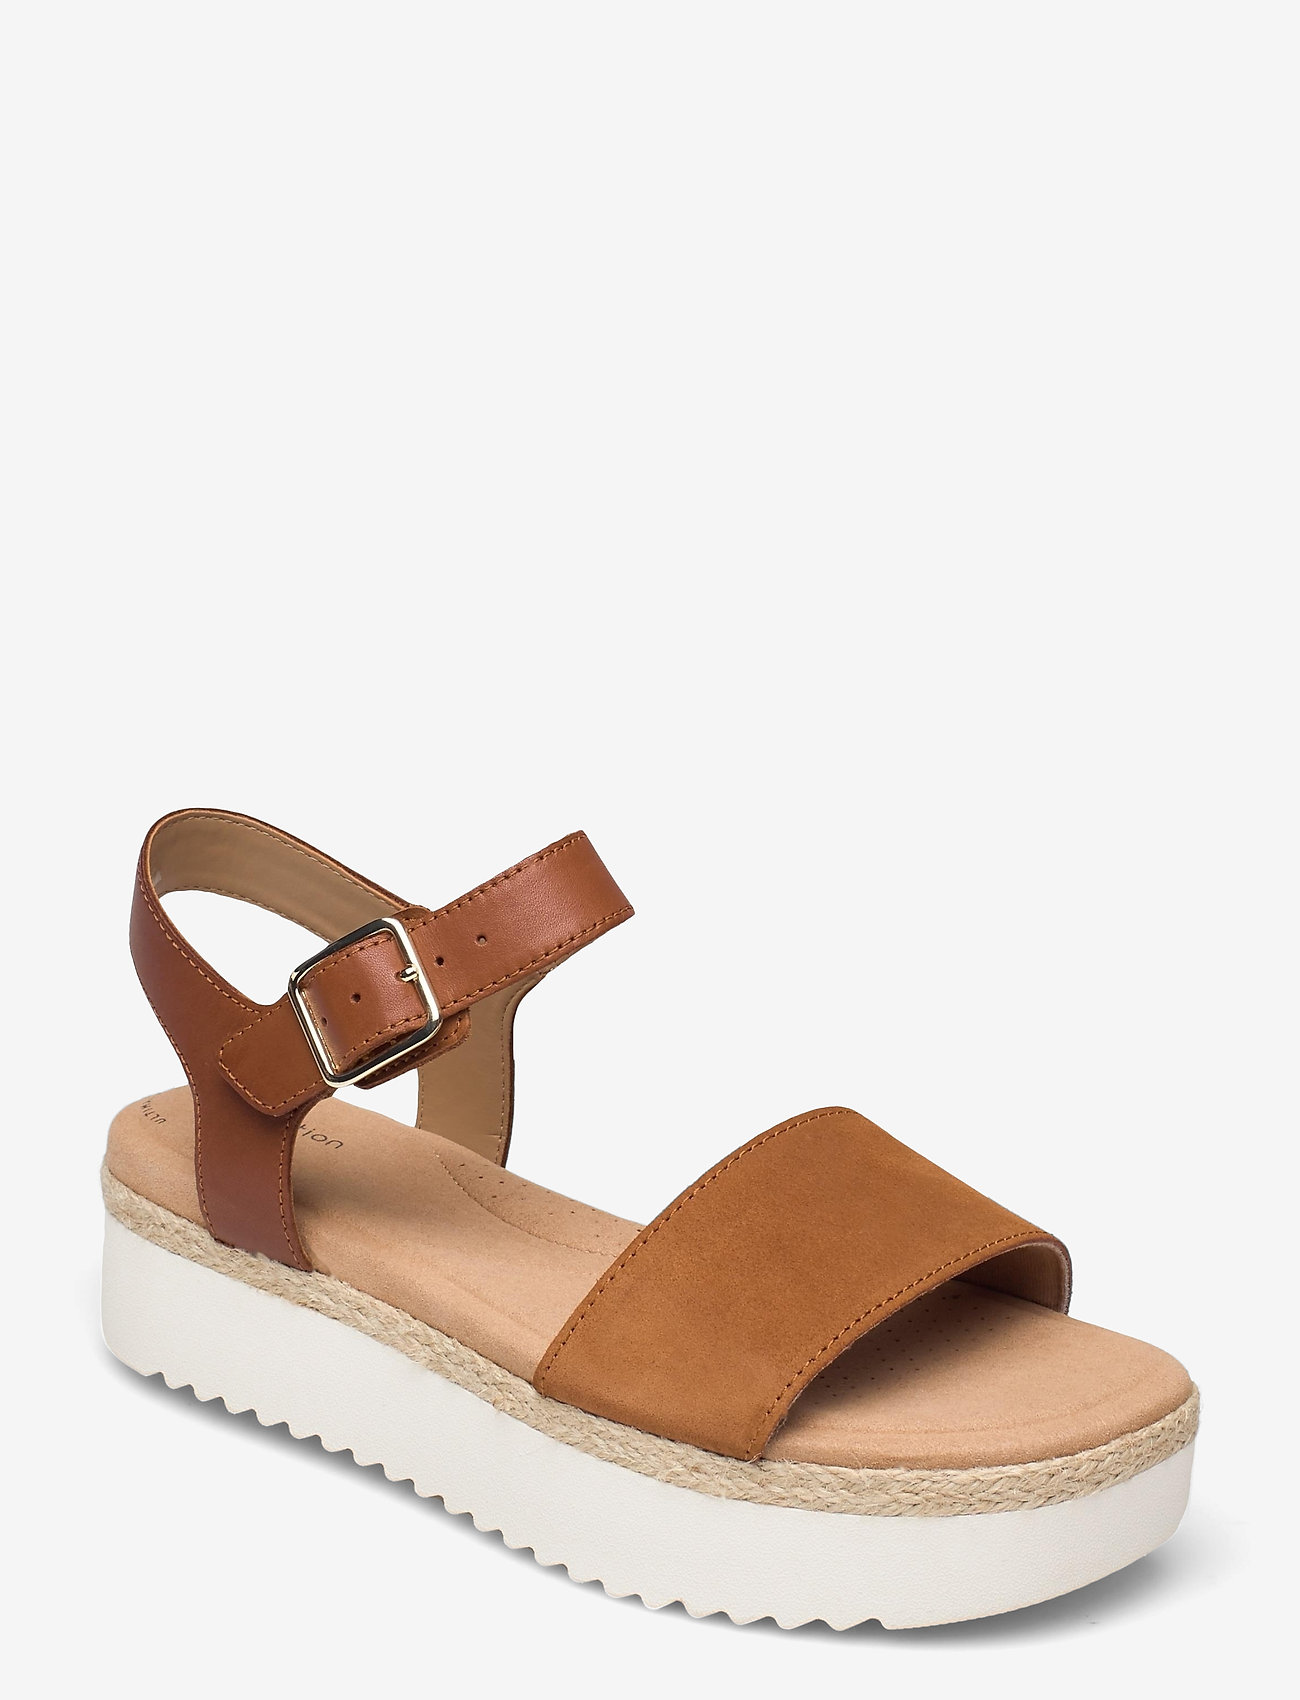 Clarks - Lana Shore - platta sandaler - dark tan - 0